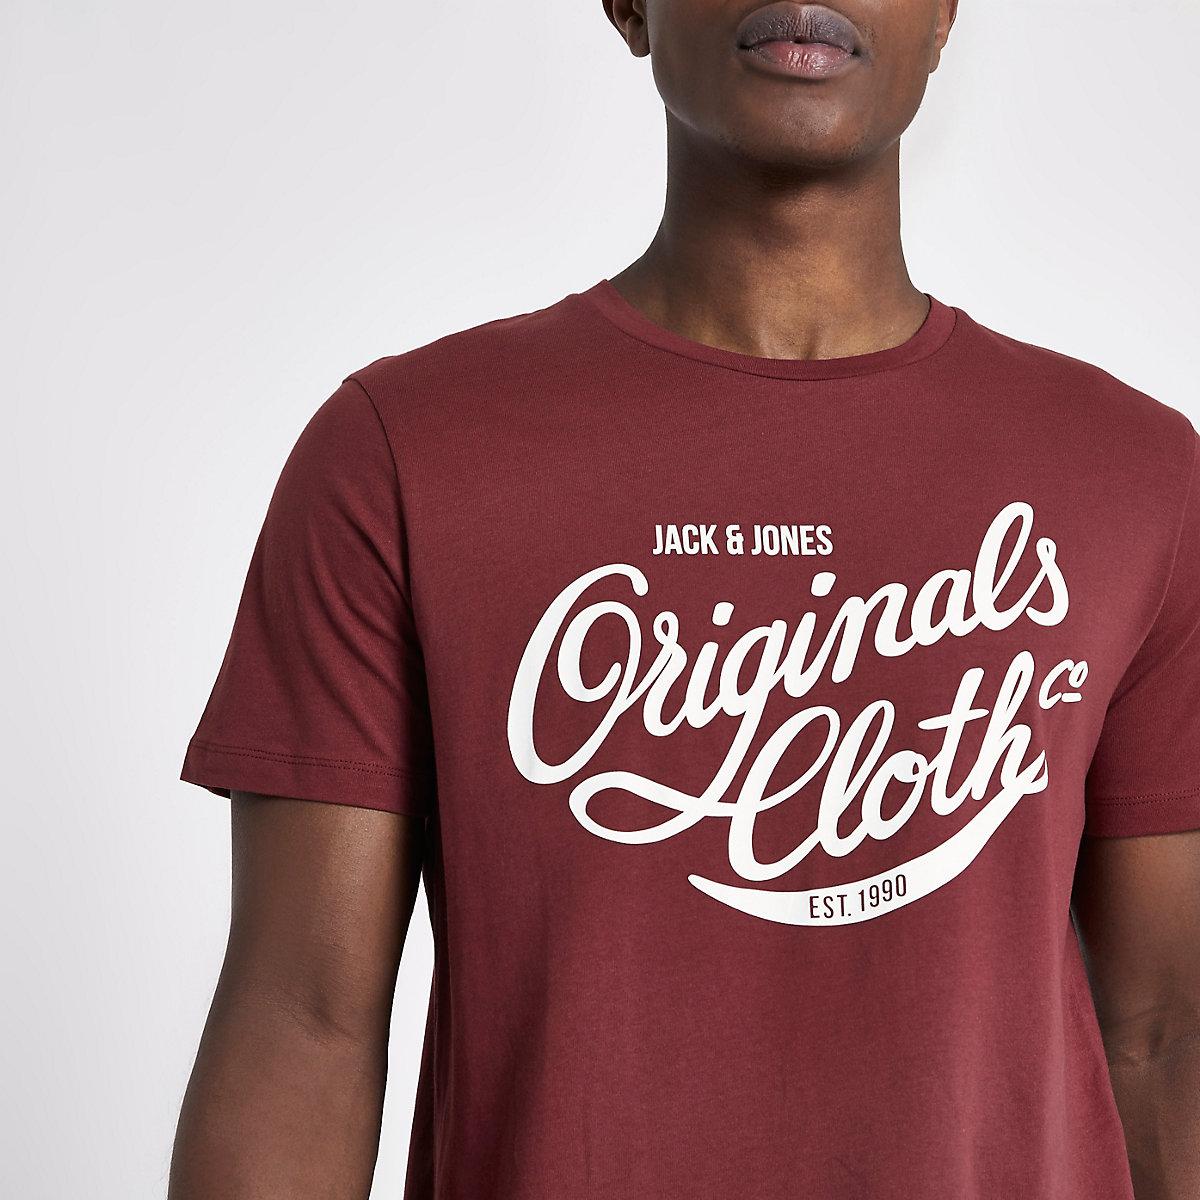 Jack & Jones dark red short sleeve T-shirt